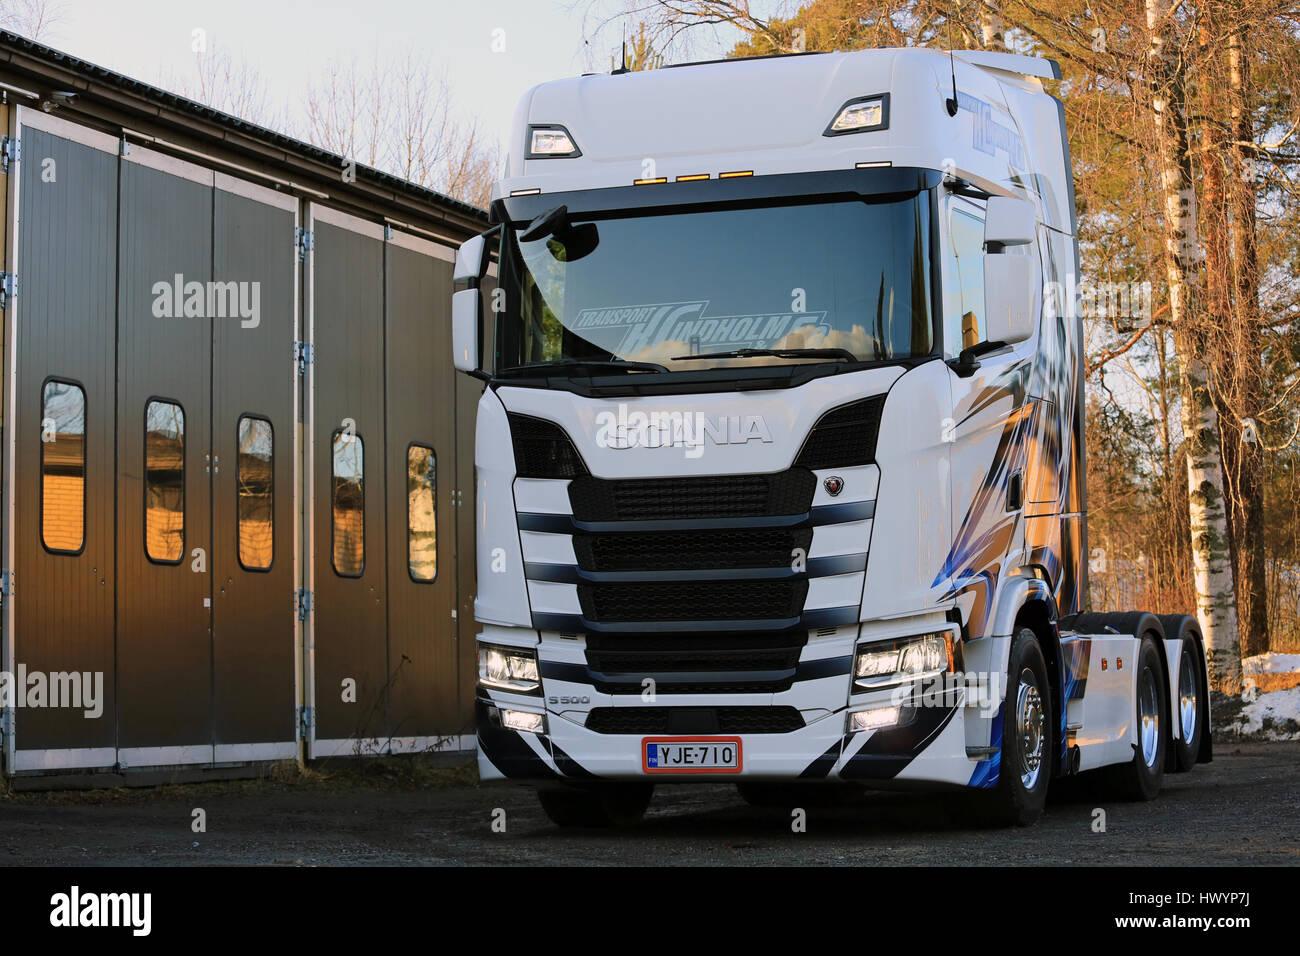 RASEBORG, FINLAND - NOVEMBER 19, 2016: Next Generation Scania S500 of Transport K Lindholm & Co. parked on a - Stock Image